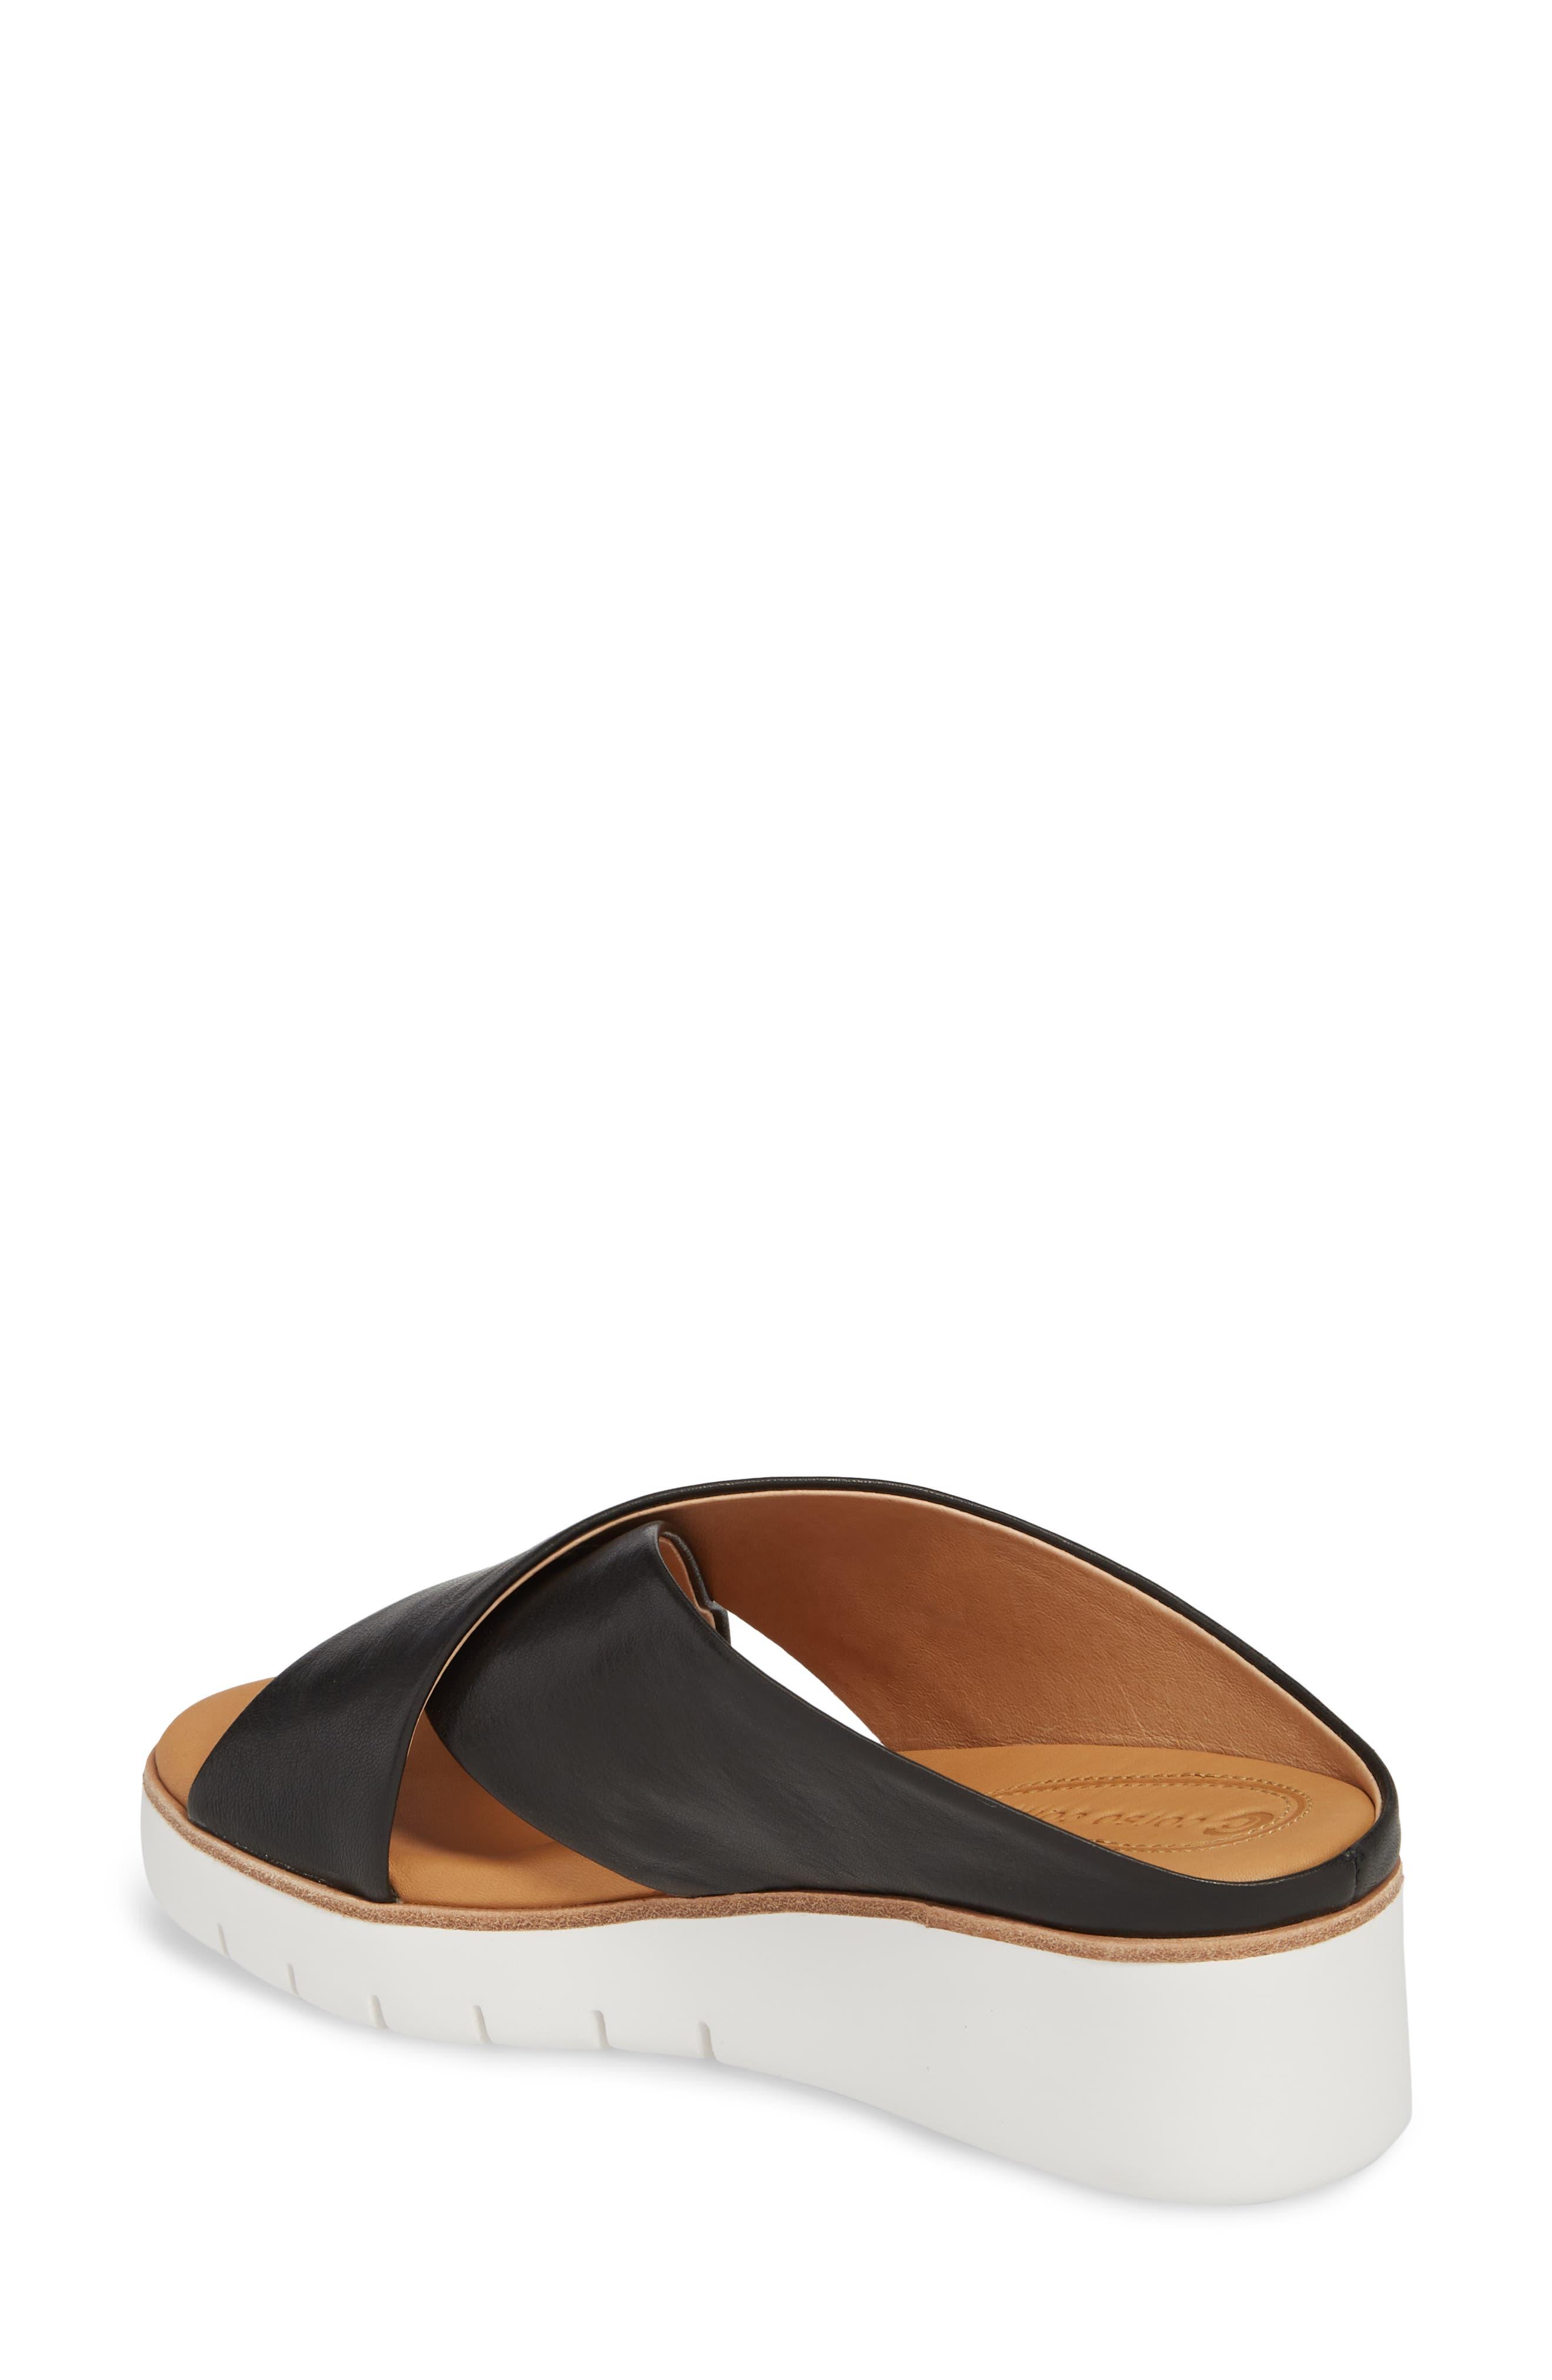 Brunna Sandal,                             Alternate thumbnail 2, color,                             Black Leather